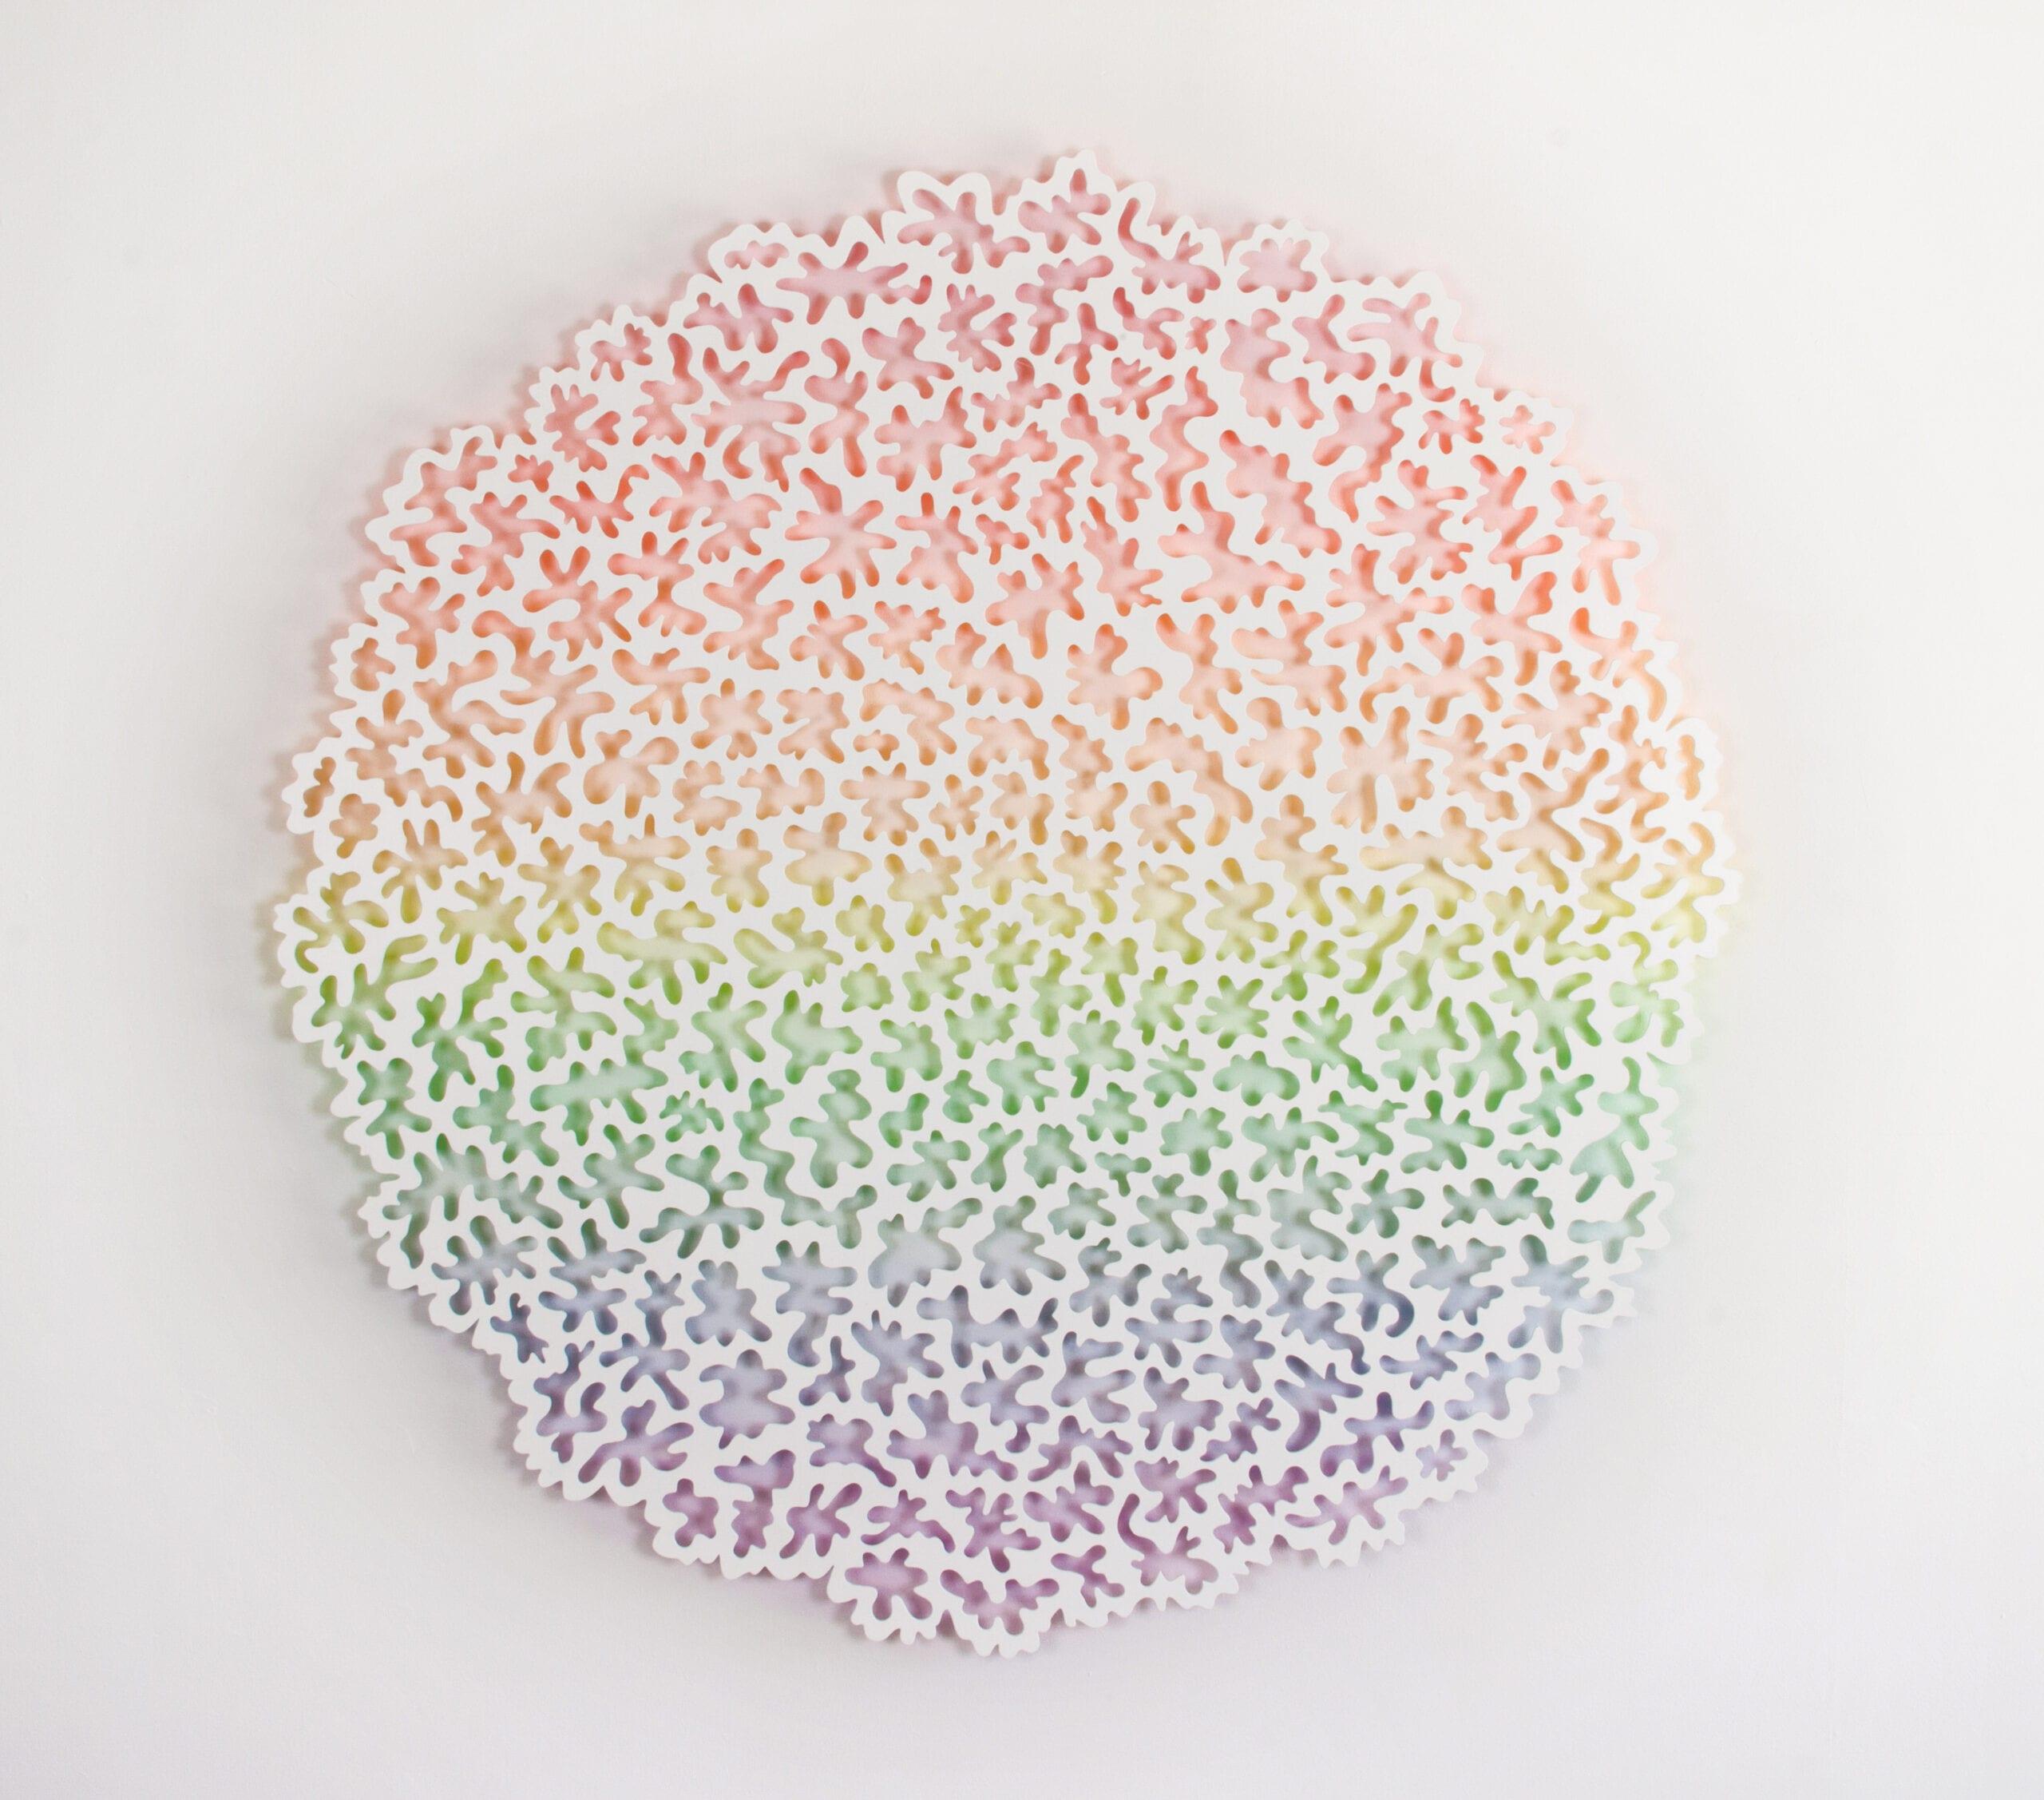 "Jen Stark, Glow, Aluminum, powder coat paint, acrylic paint, 48"" x 48"" x 1"", 2013."